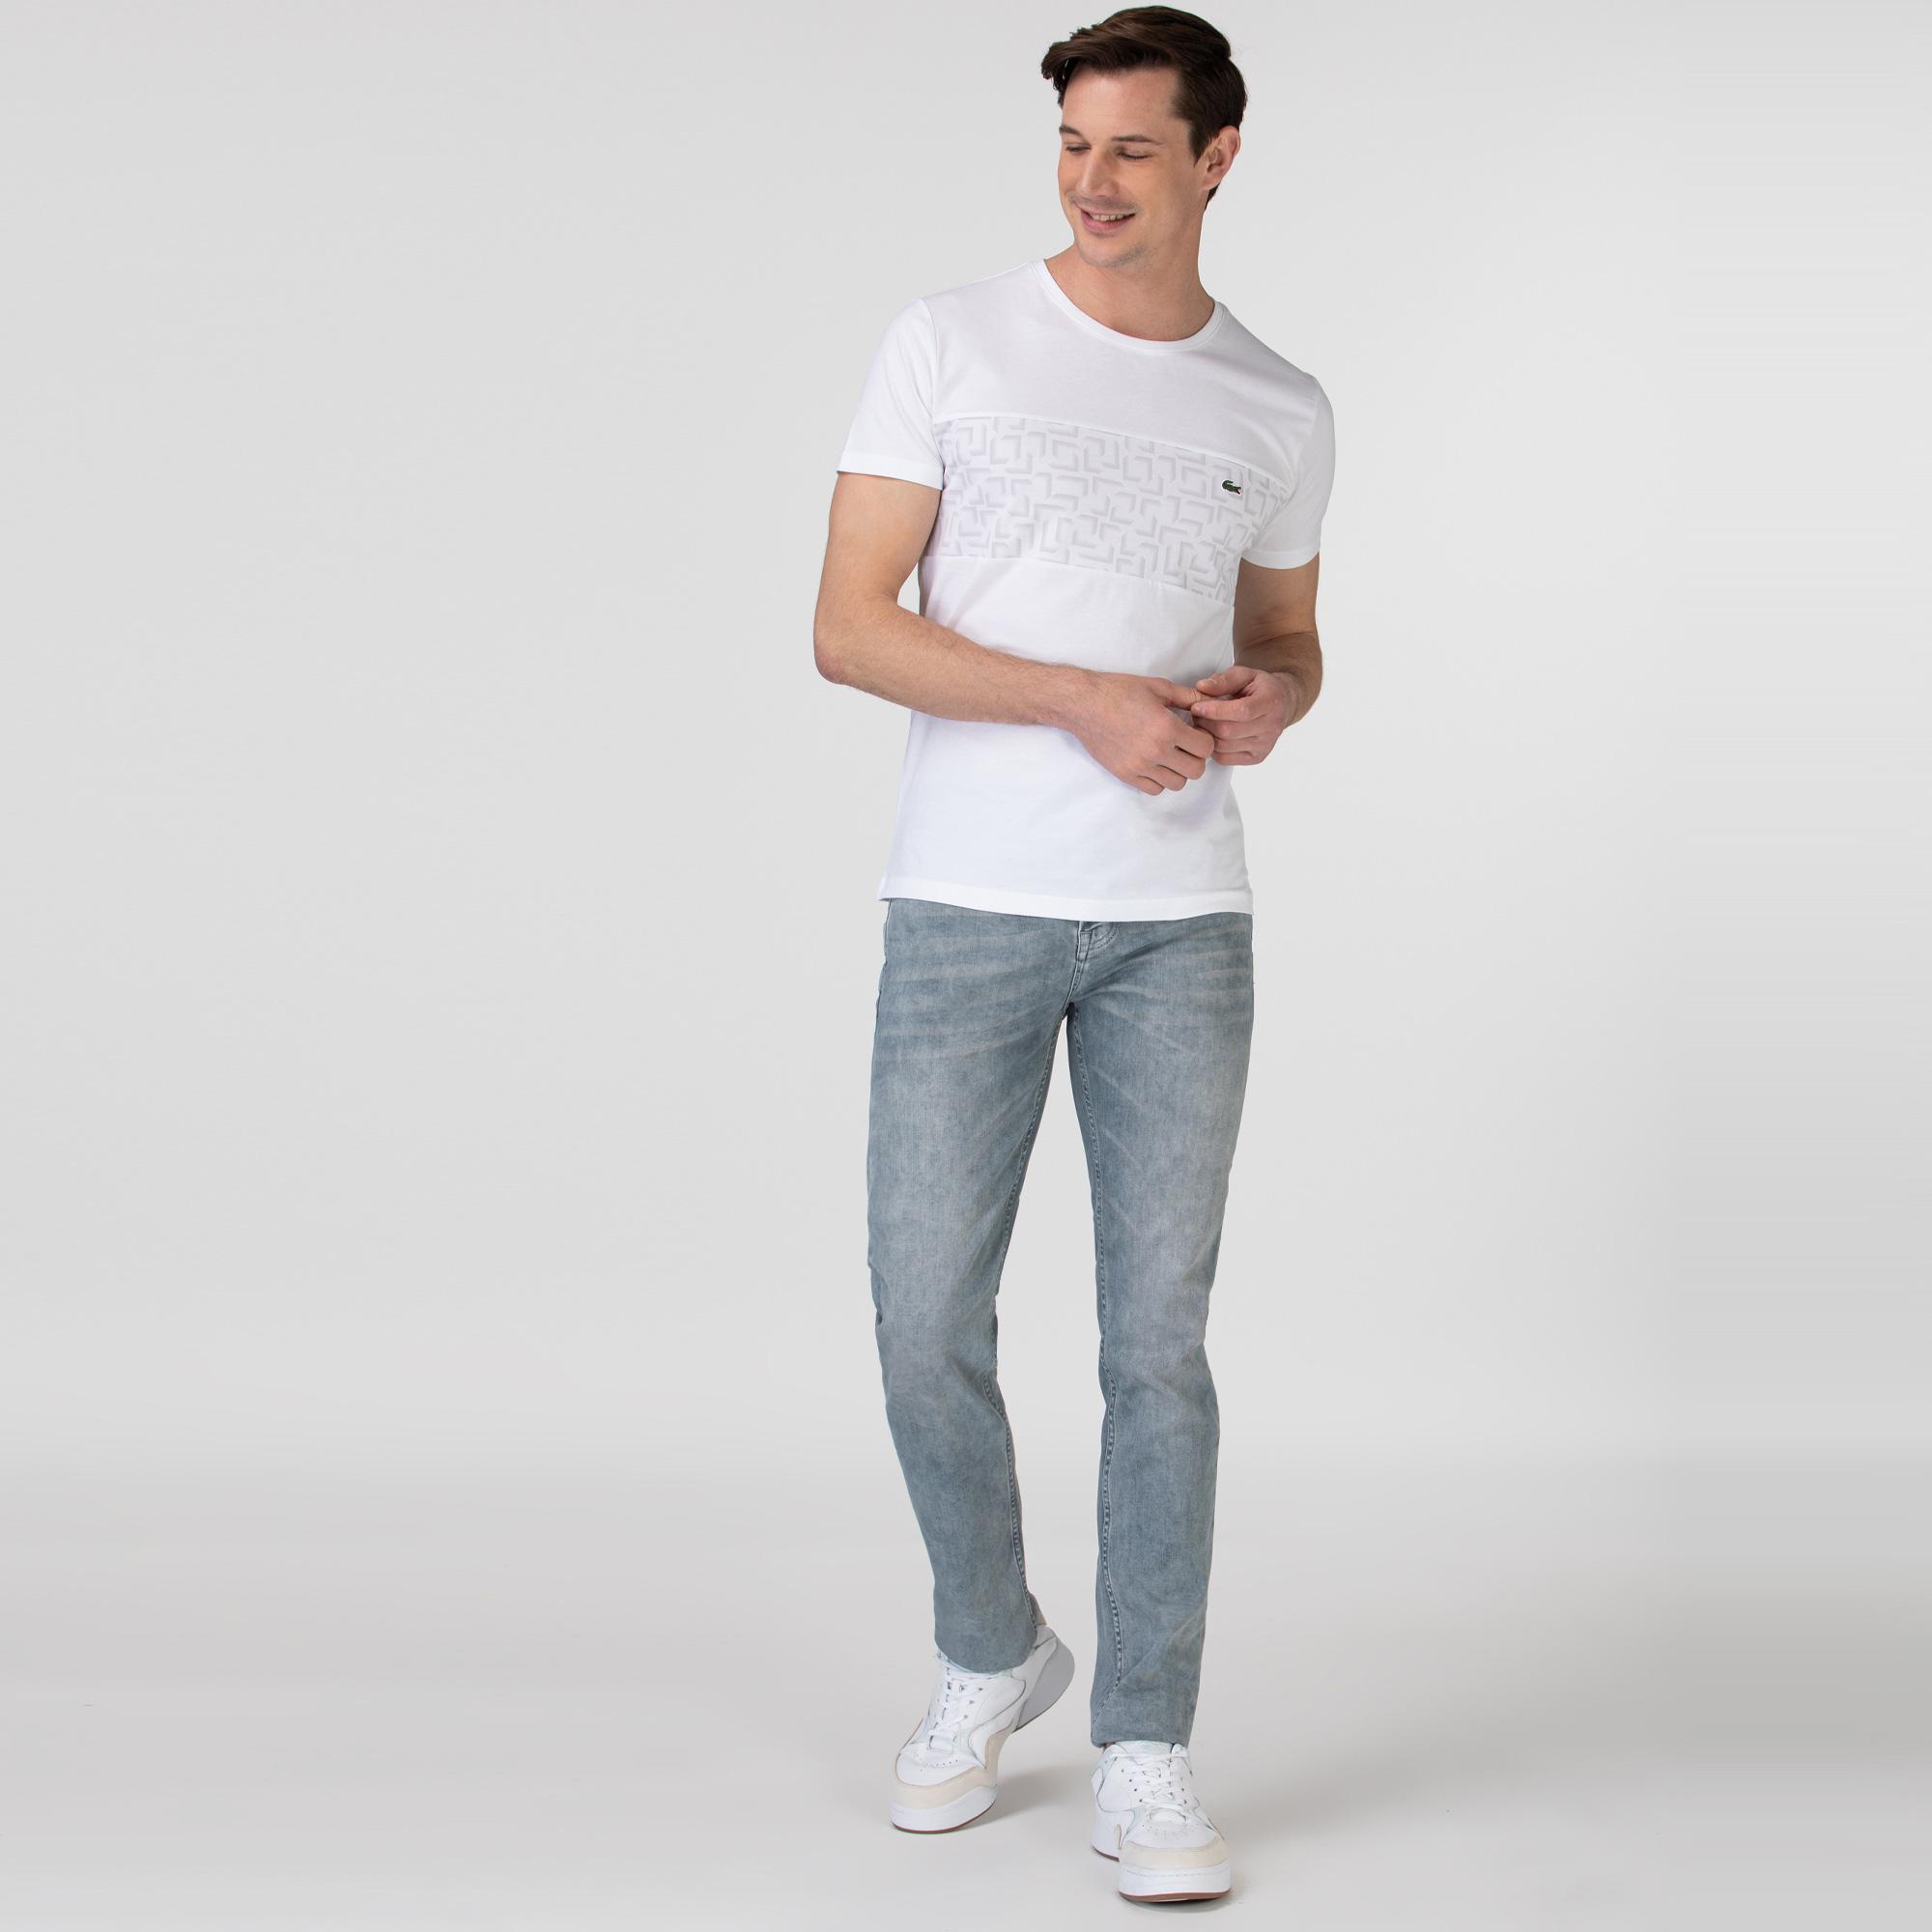 Lacoste Erkek Gri Denim Pantolon